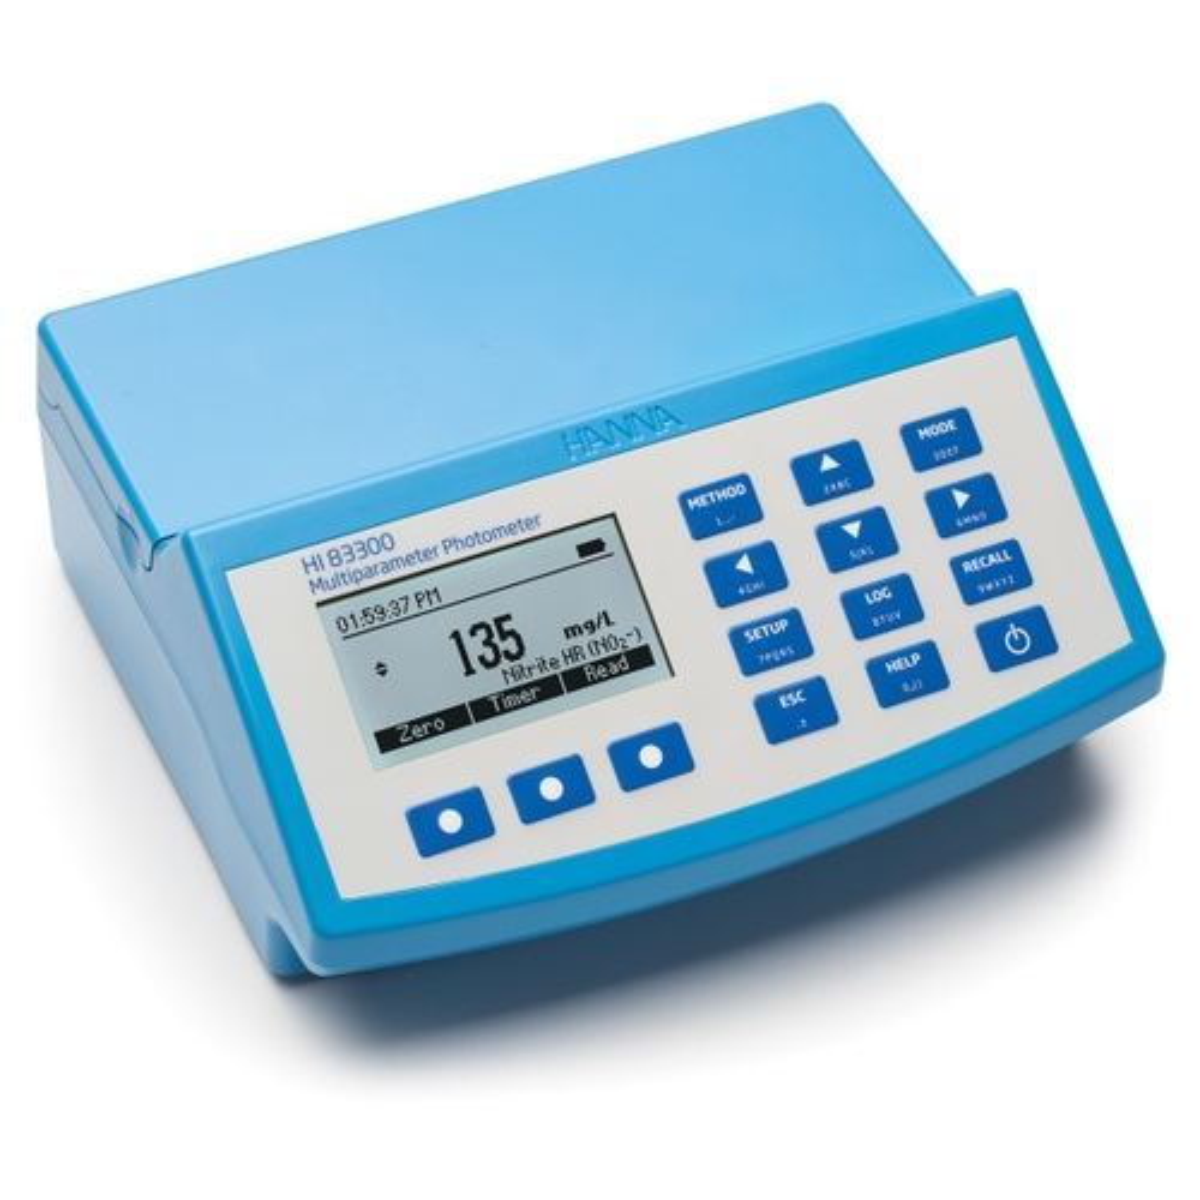 HI83300 - Fotometro multiparametro da banco (60 metodi)